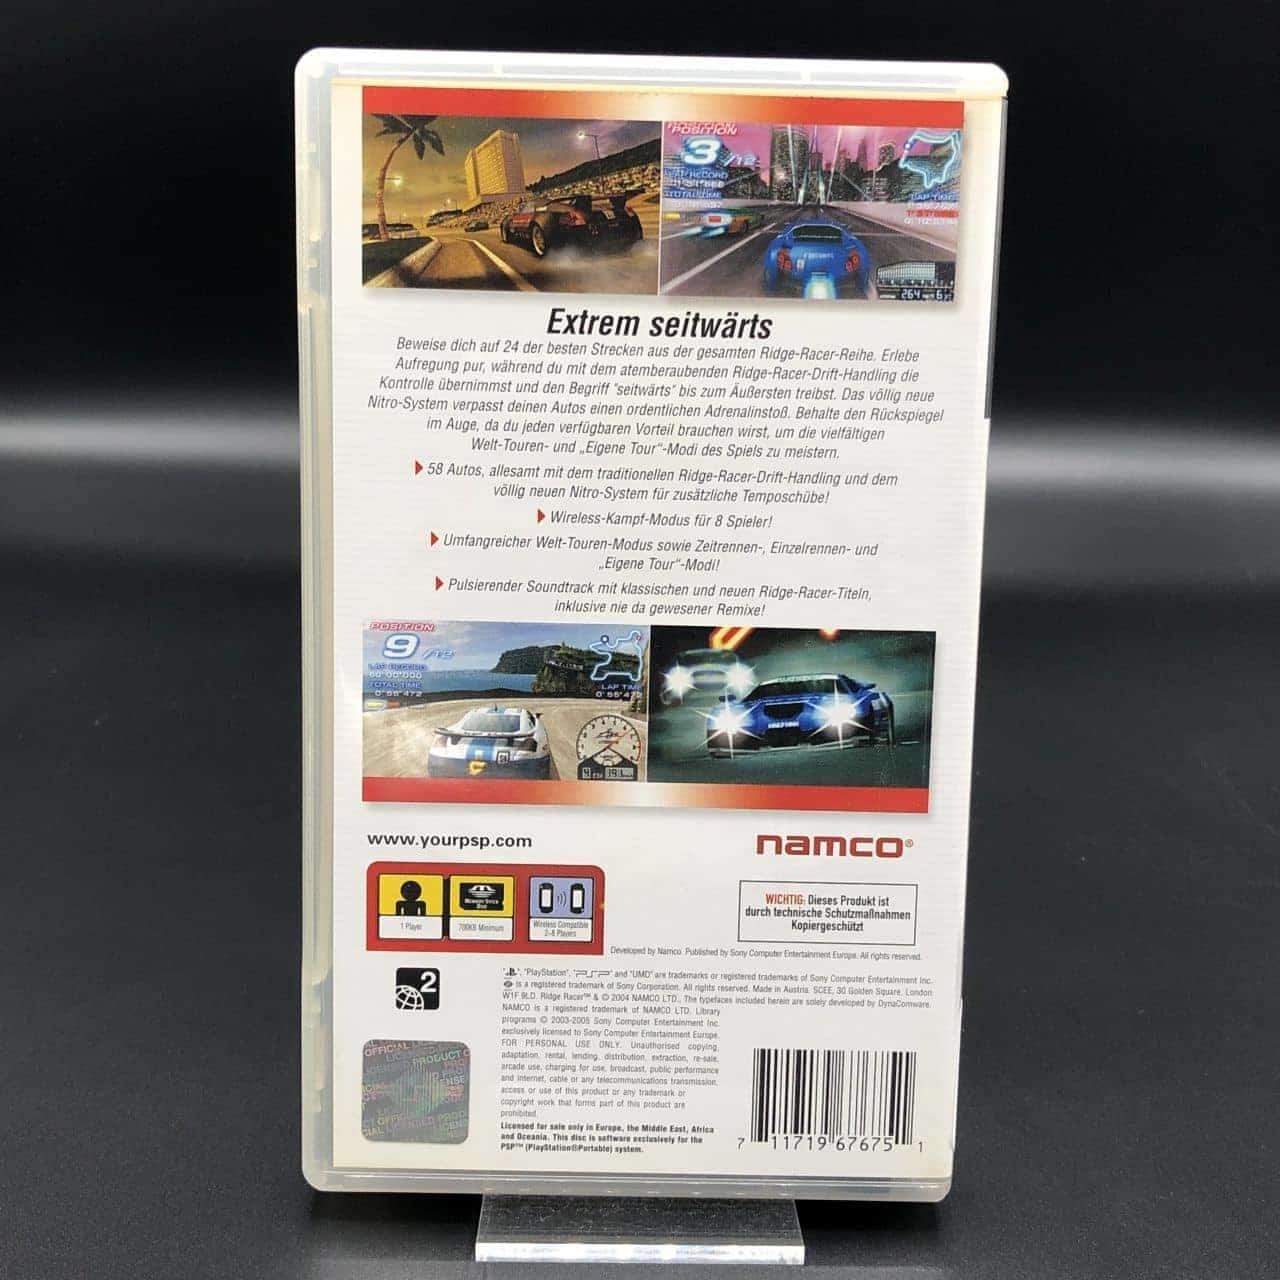 PSP Ridge Racer (Komplett) (Sehr gut) Sony PlayStation Portable